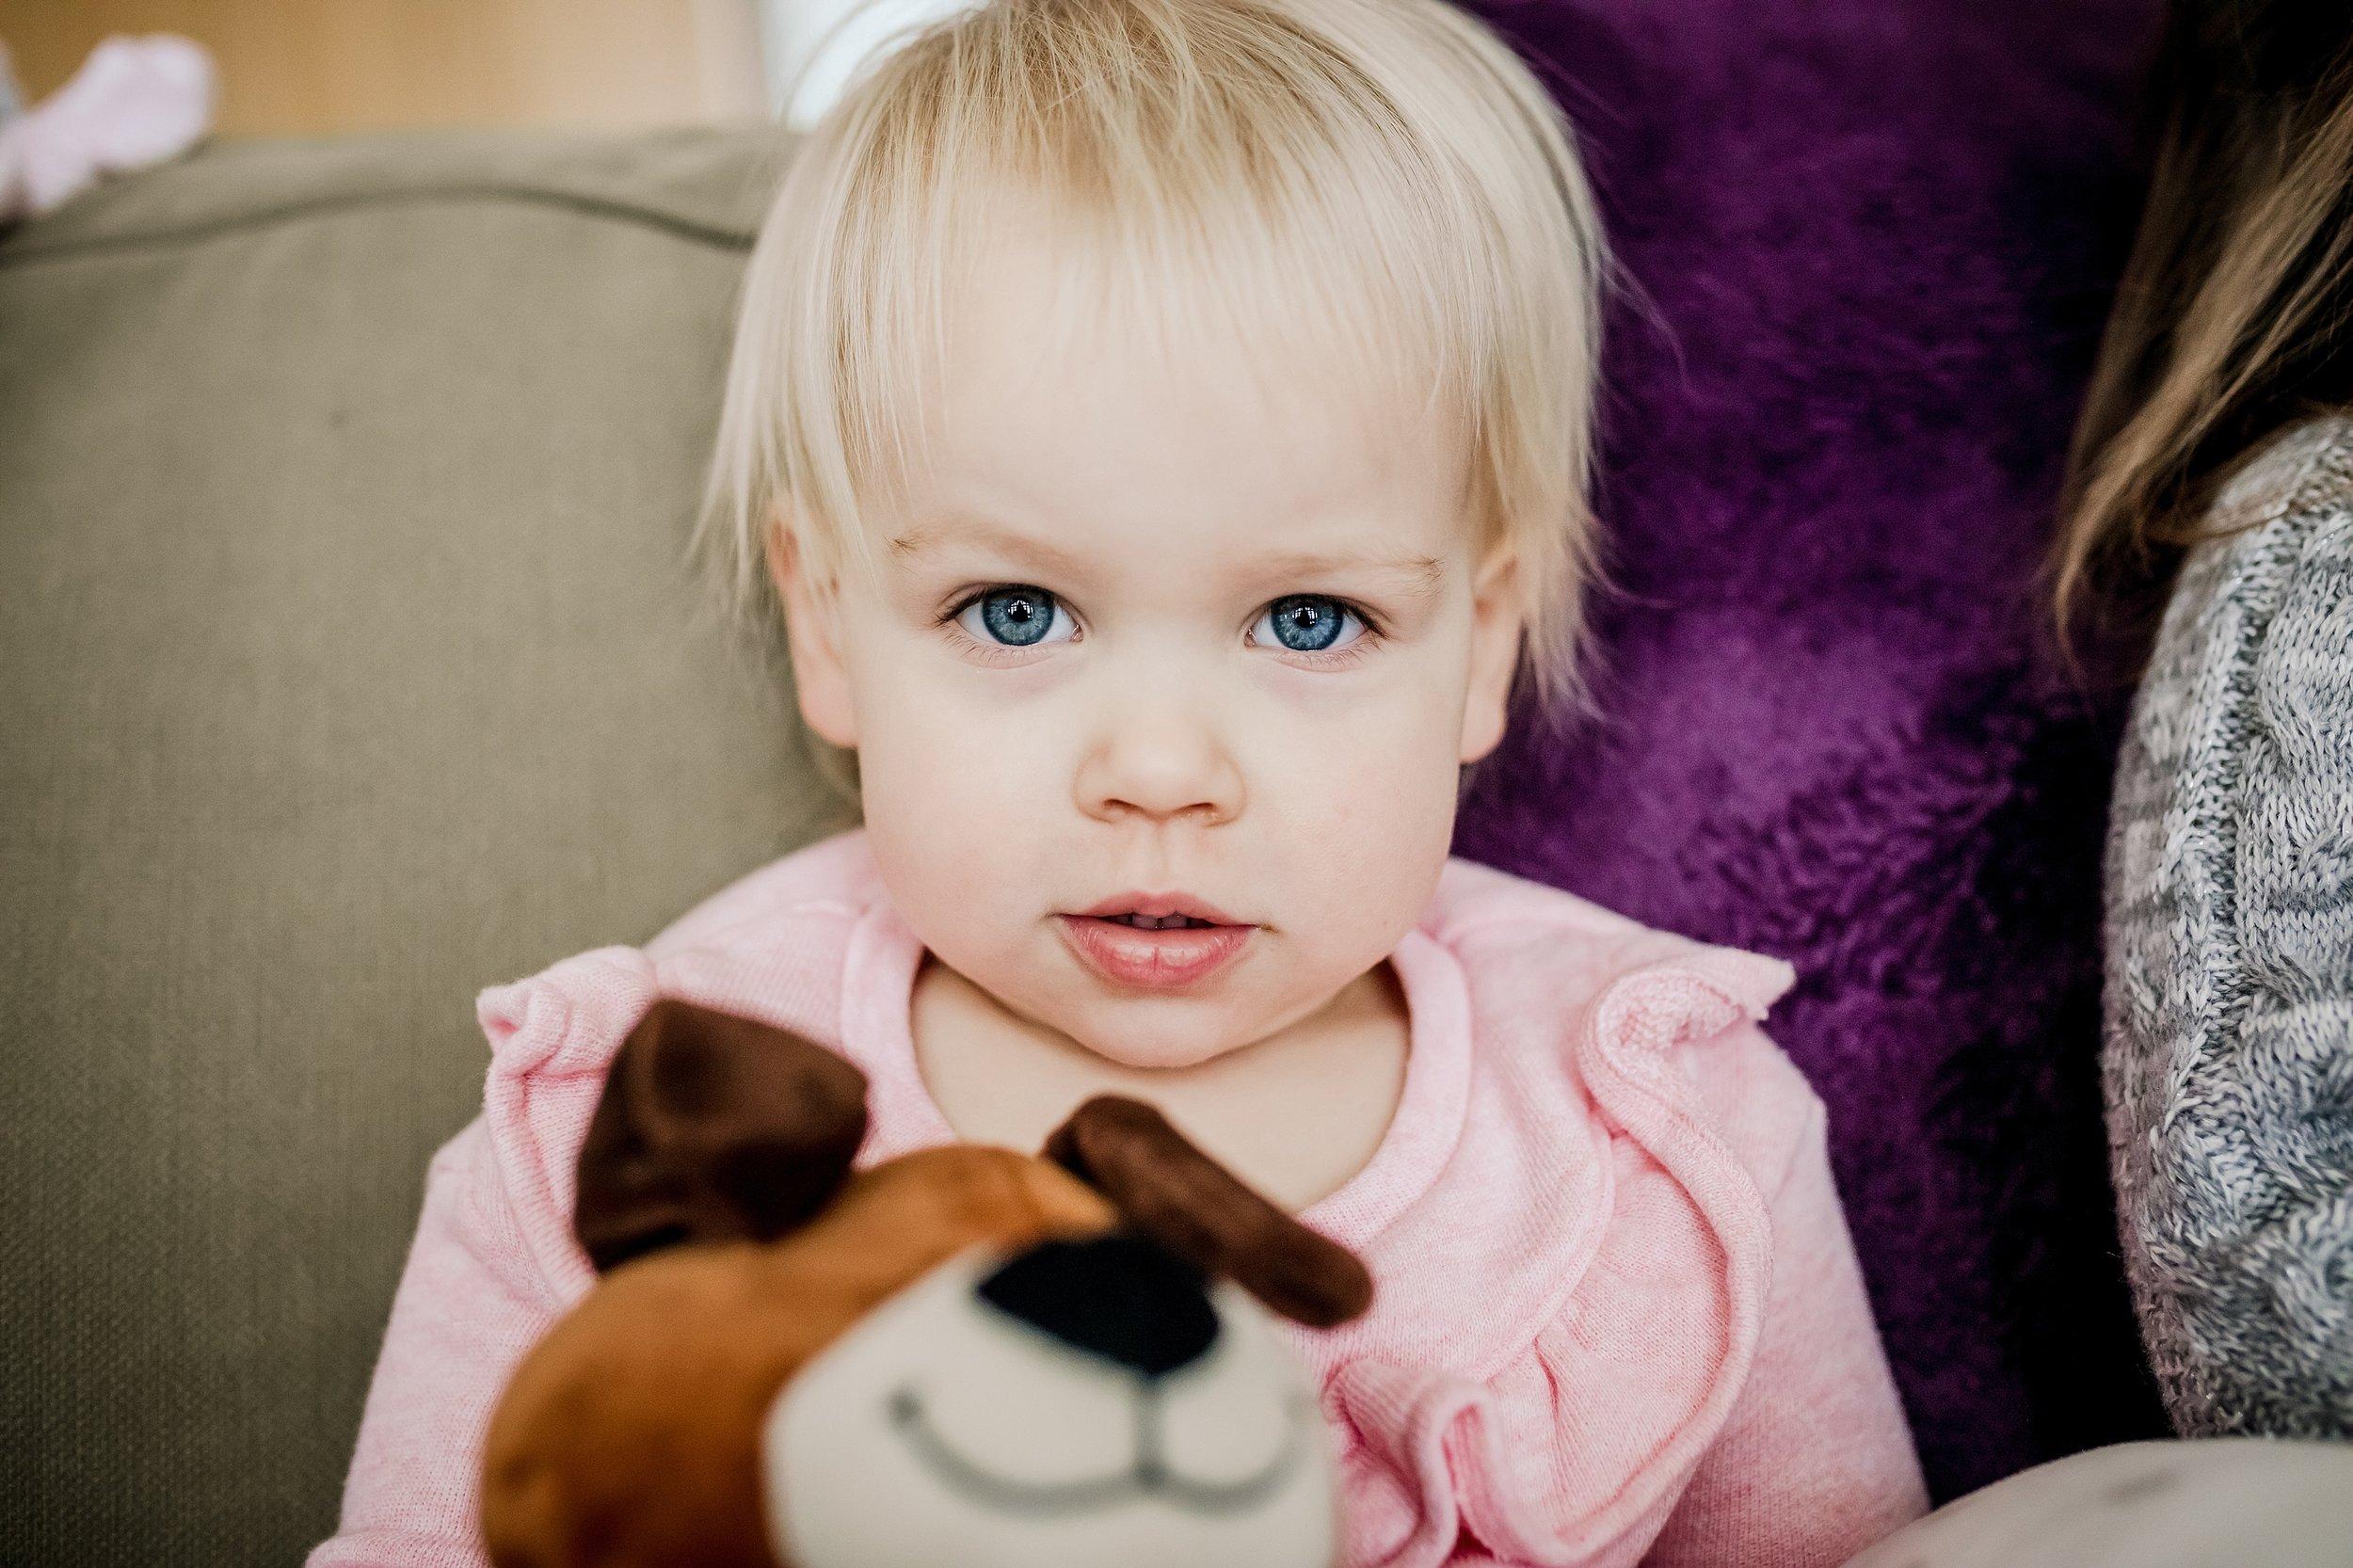 Lehigh-Valley-Documentary-Newborn-Photographer_0003.jpg